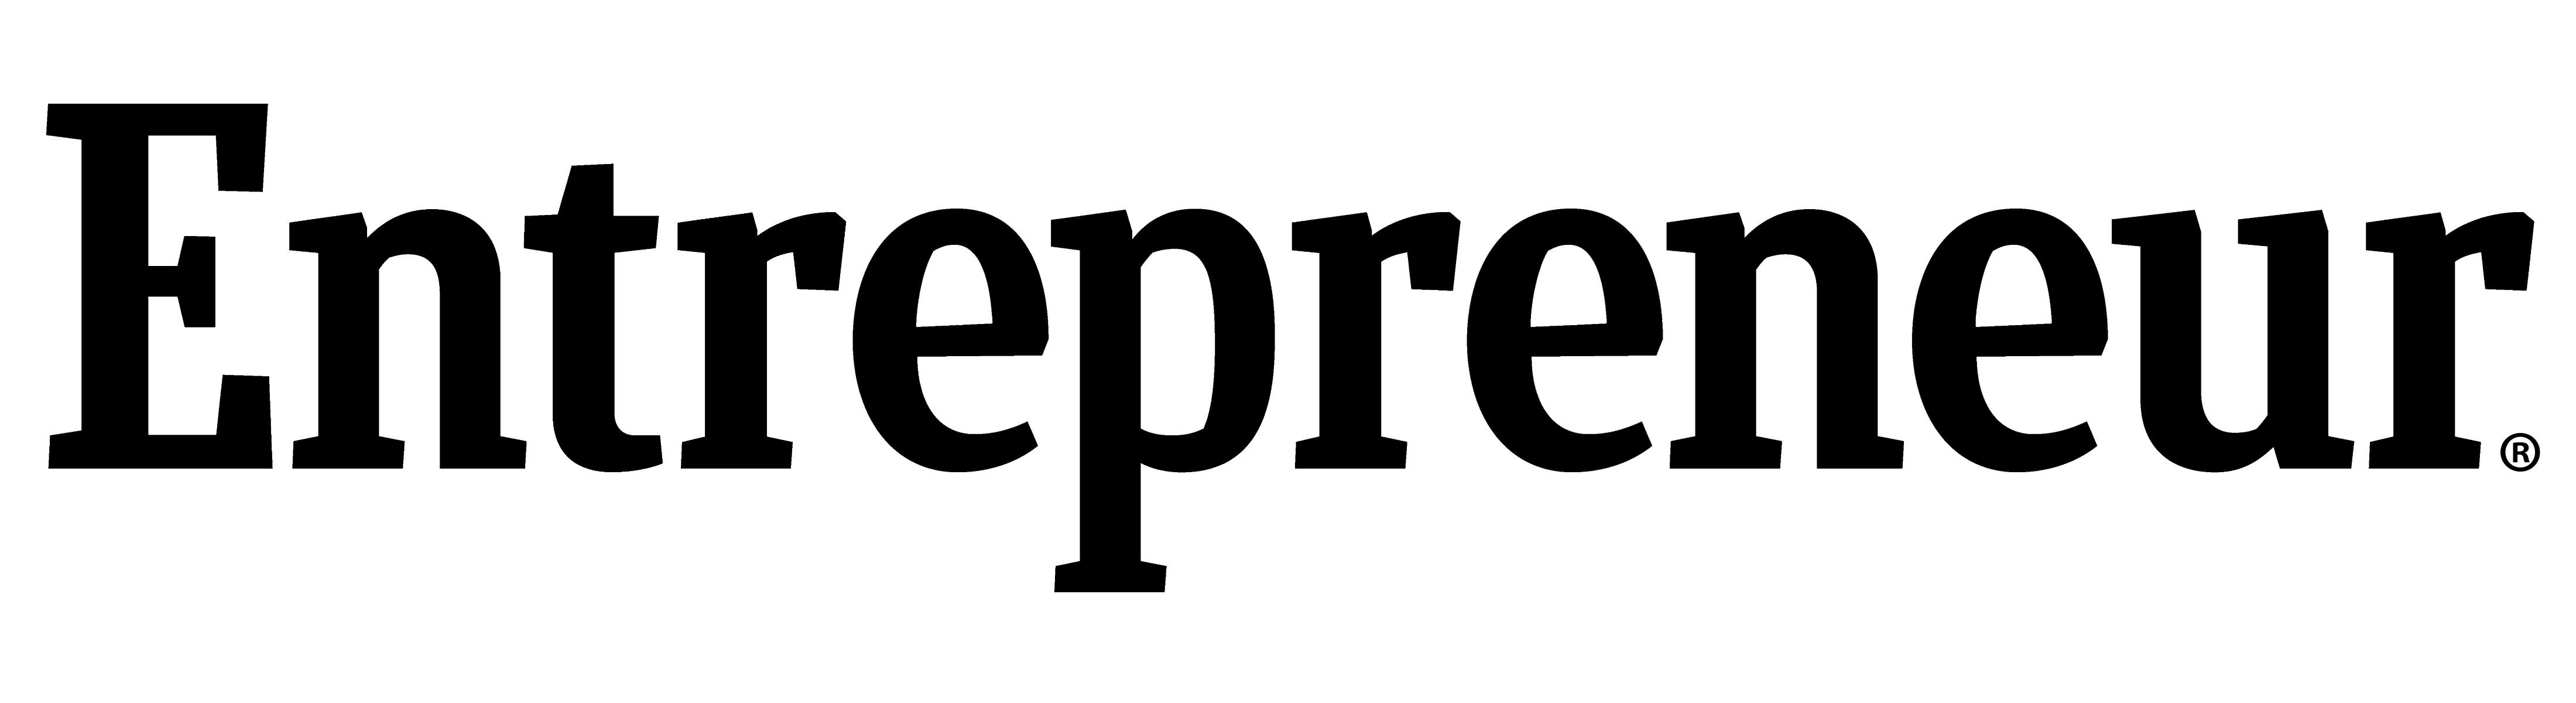 Entrepreneur logo.